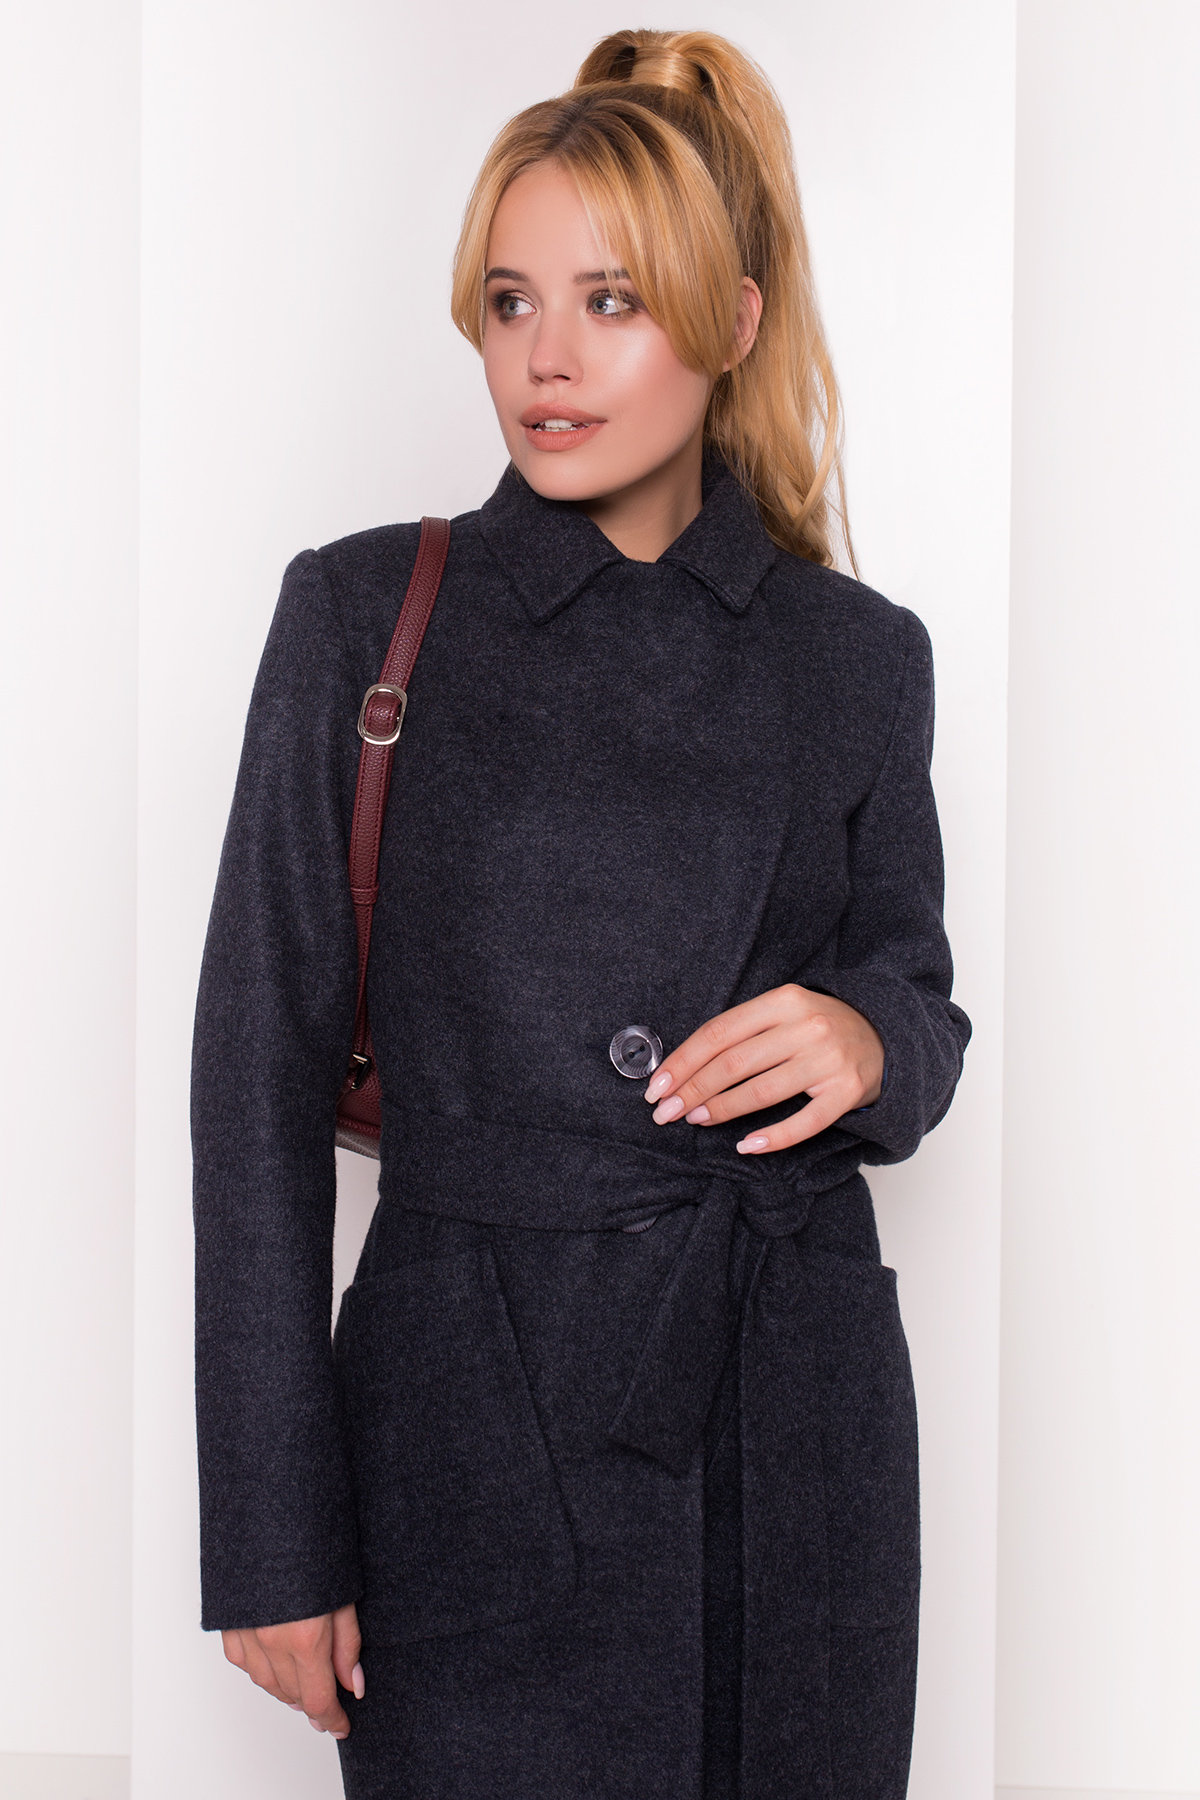 Пальто Габриэлла 4417 АРТ. 21337 Цвет: Темно-синий - фото 4, интернет магазин tm-modus.ru